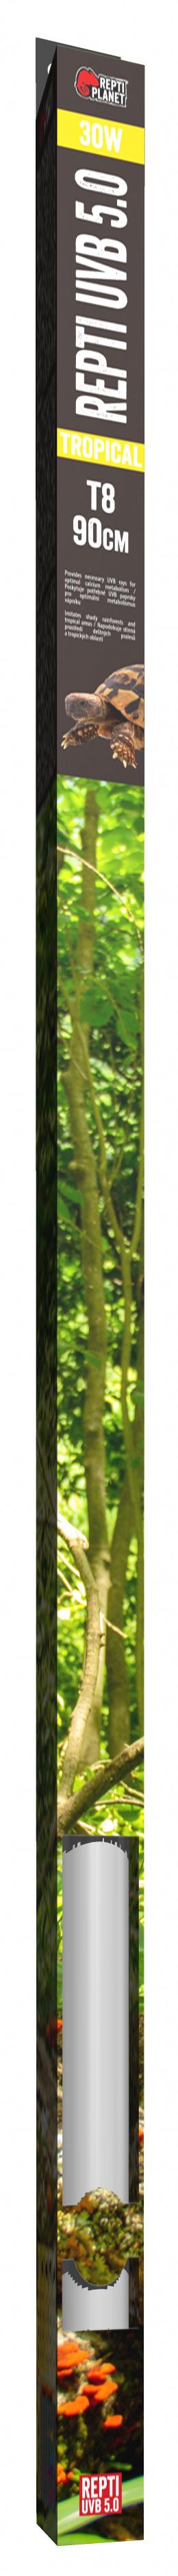 Лампа для террариумов - ReptiPlanet Repti T8 UVB 5.0 30W, 90 см